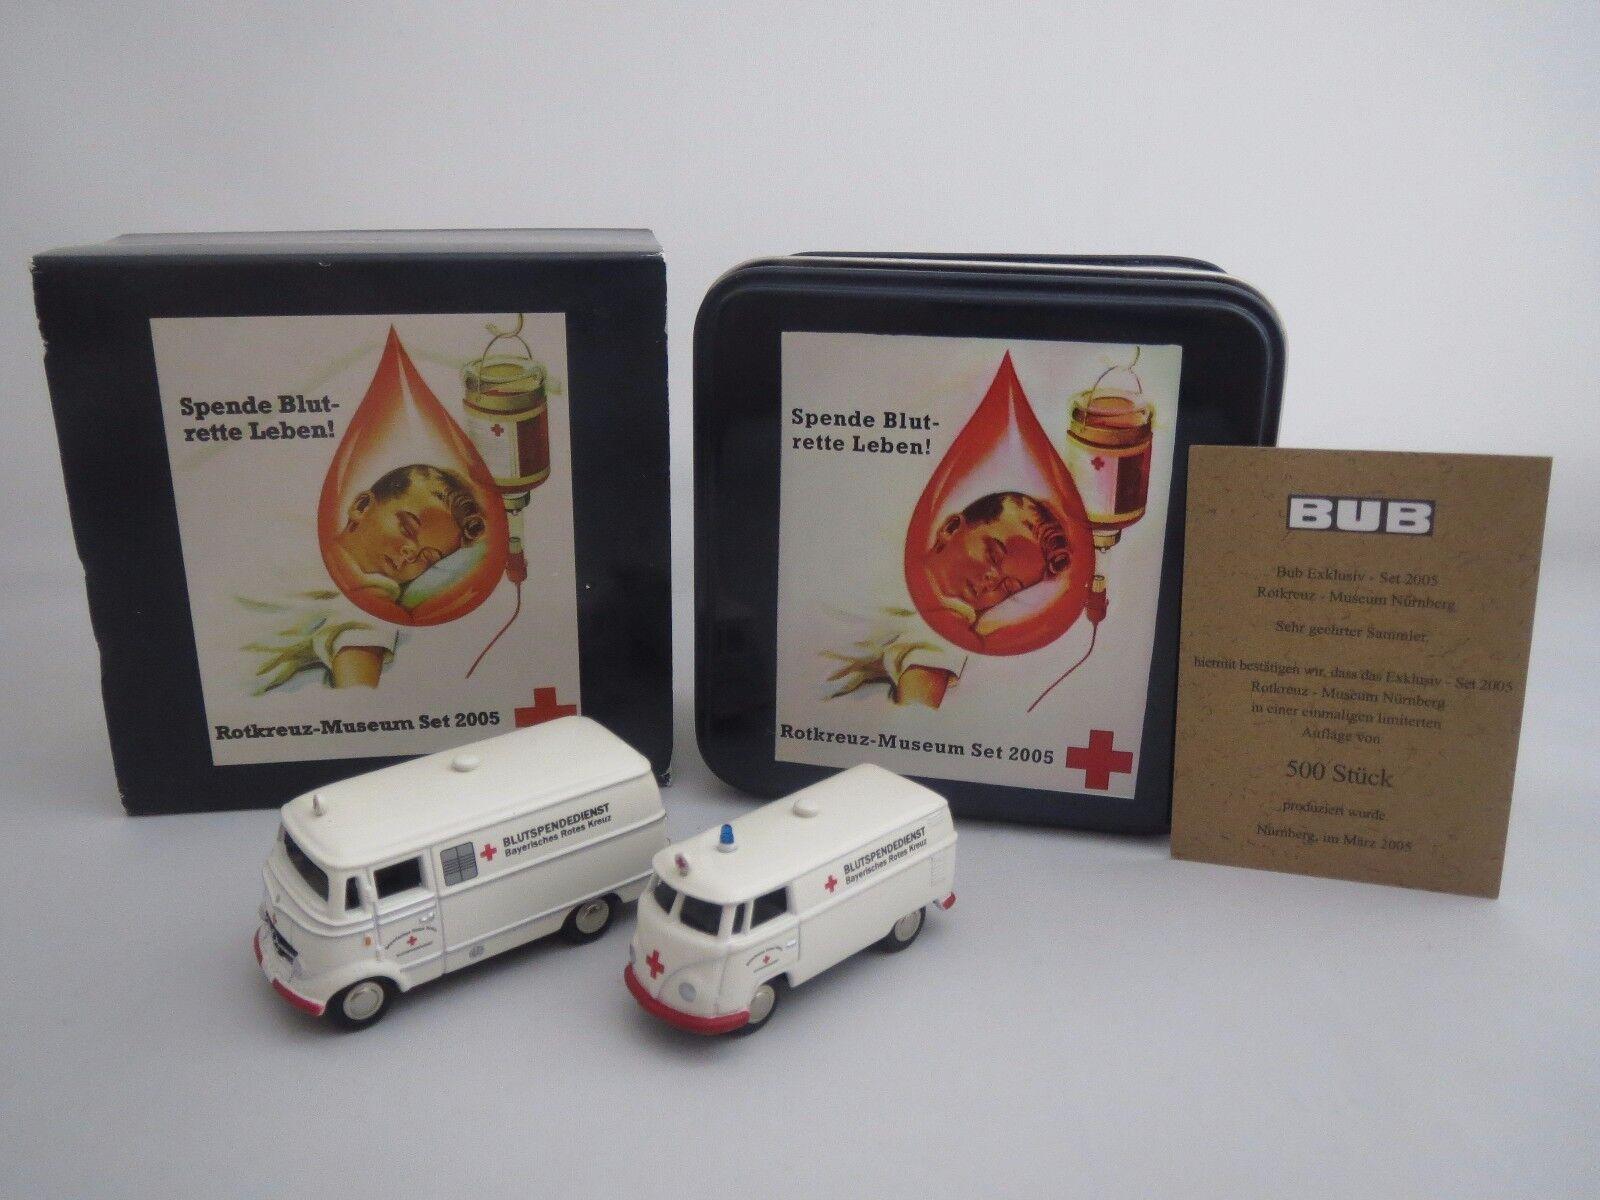 Bouèbe Mercedes-Benz l319 & VW Transporter (croix-Musée Nuremberg) 1 87 Neuf dans sa boîte